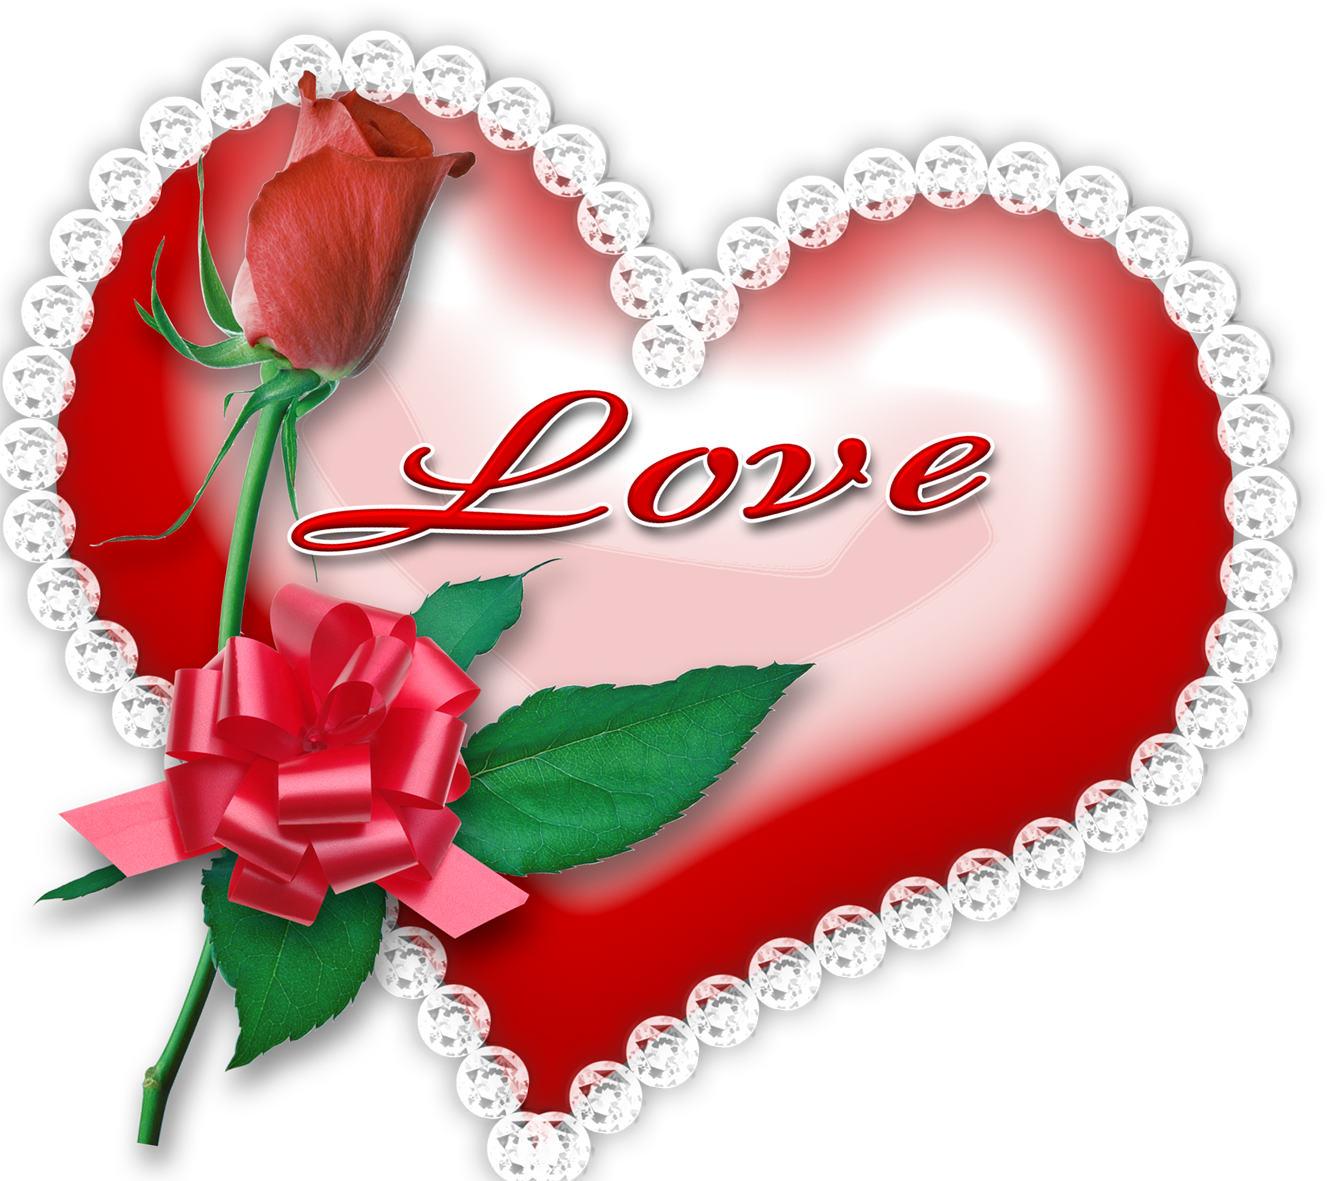 http://img-fotki.yandex.ru/get/5636/41771327.34f/0_86e36_68eb9548_orig.png